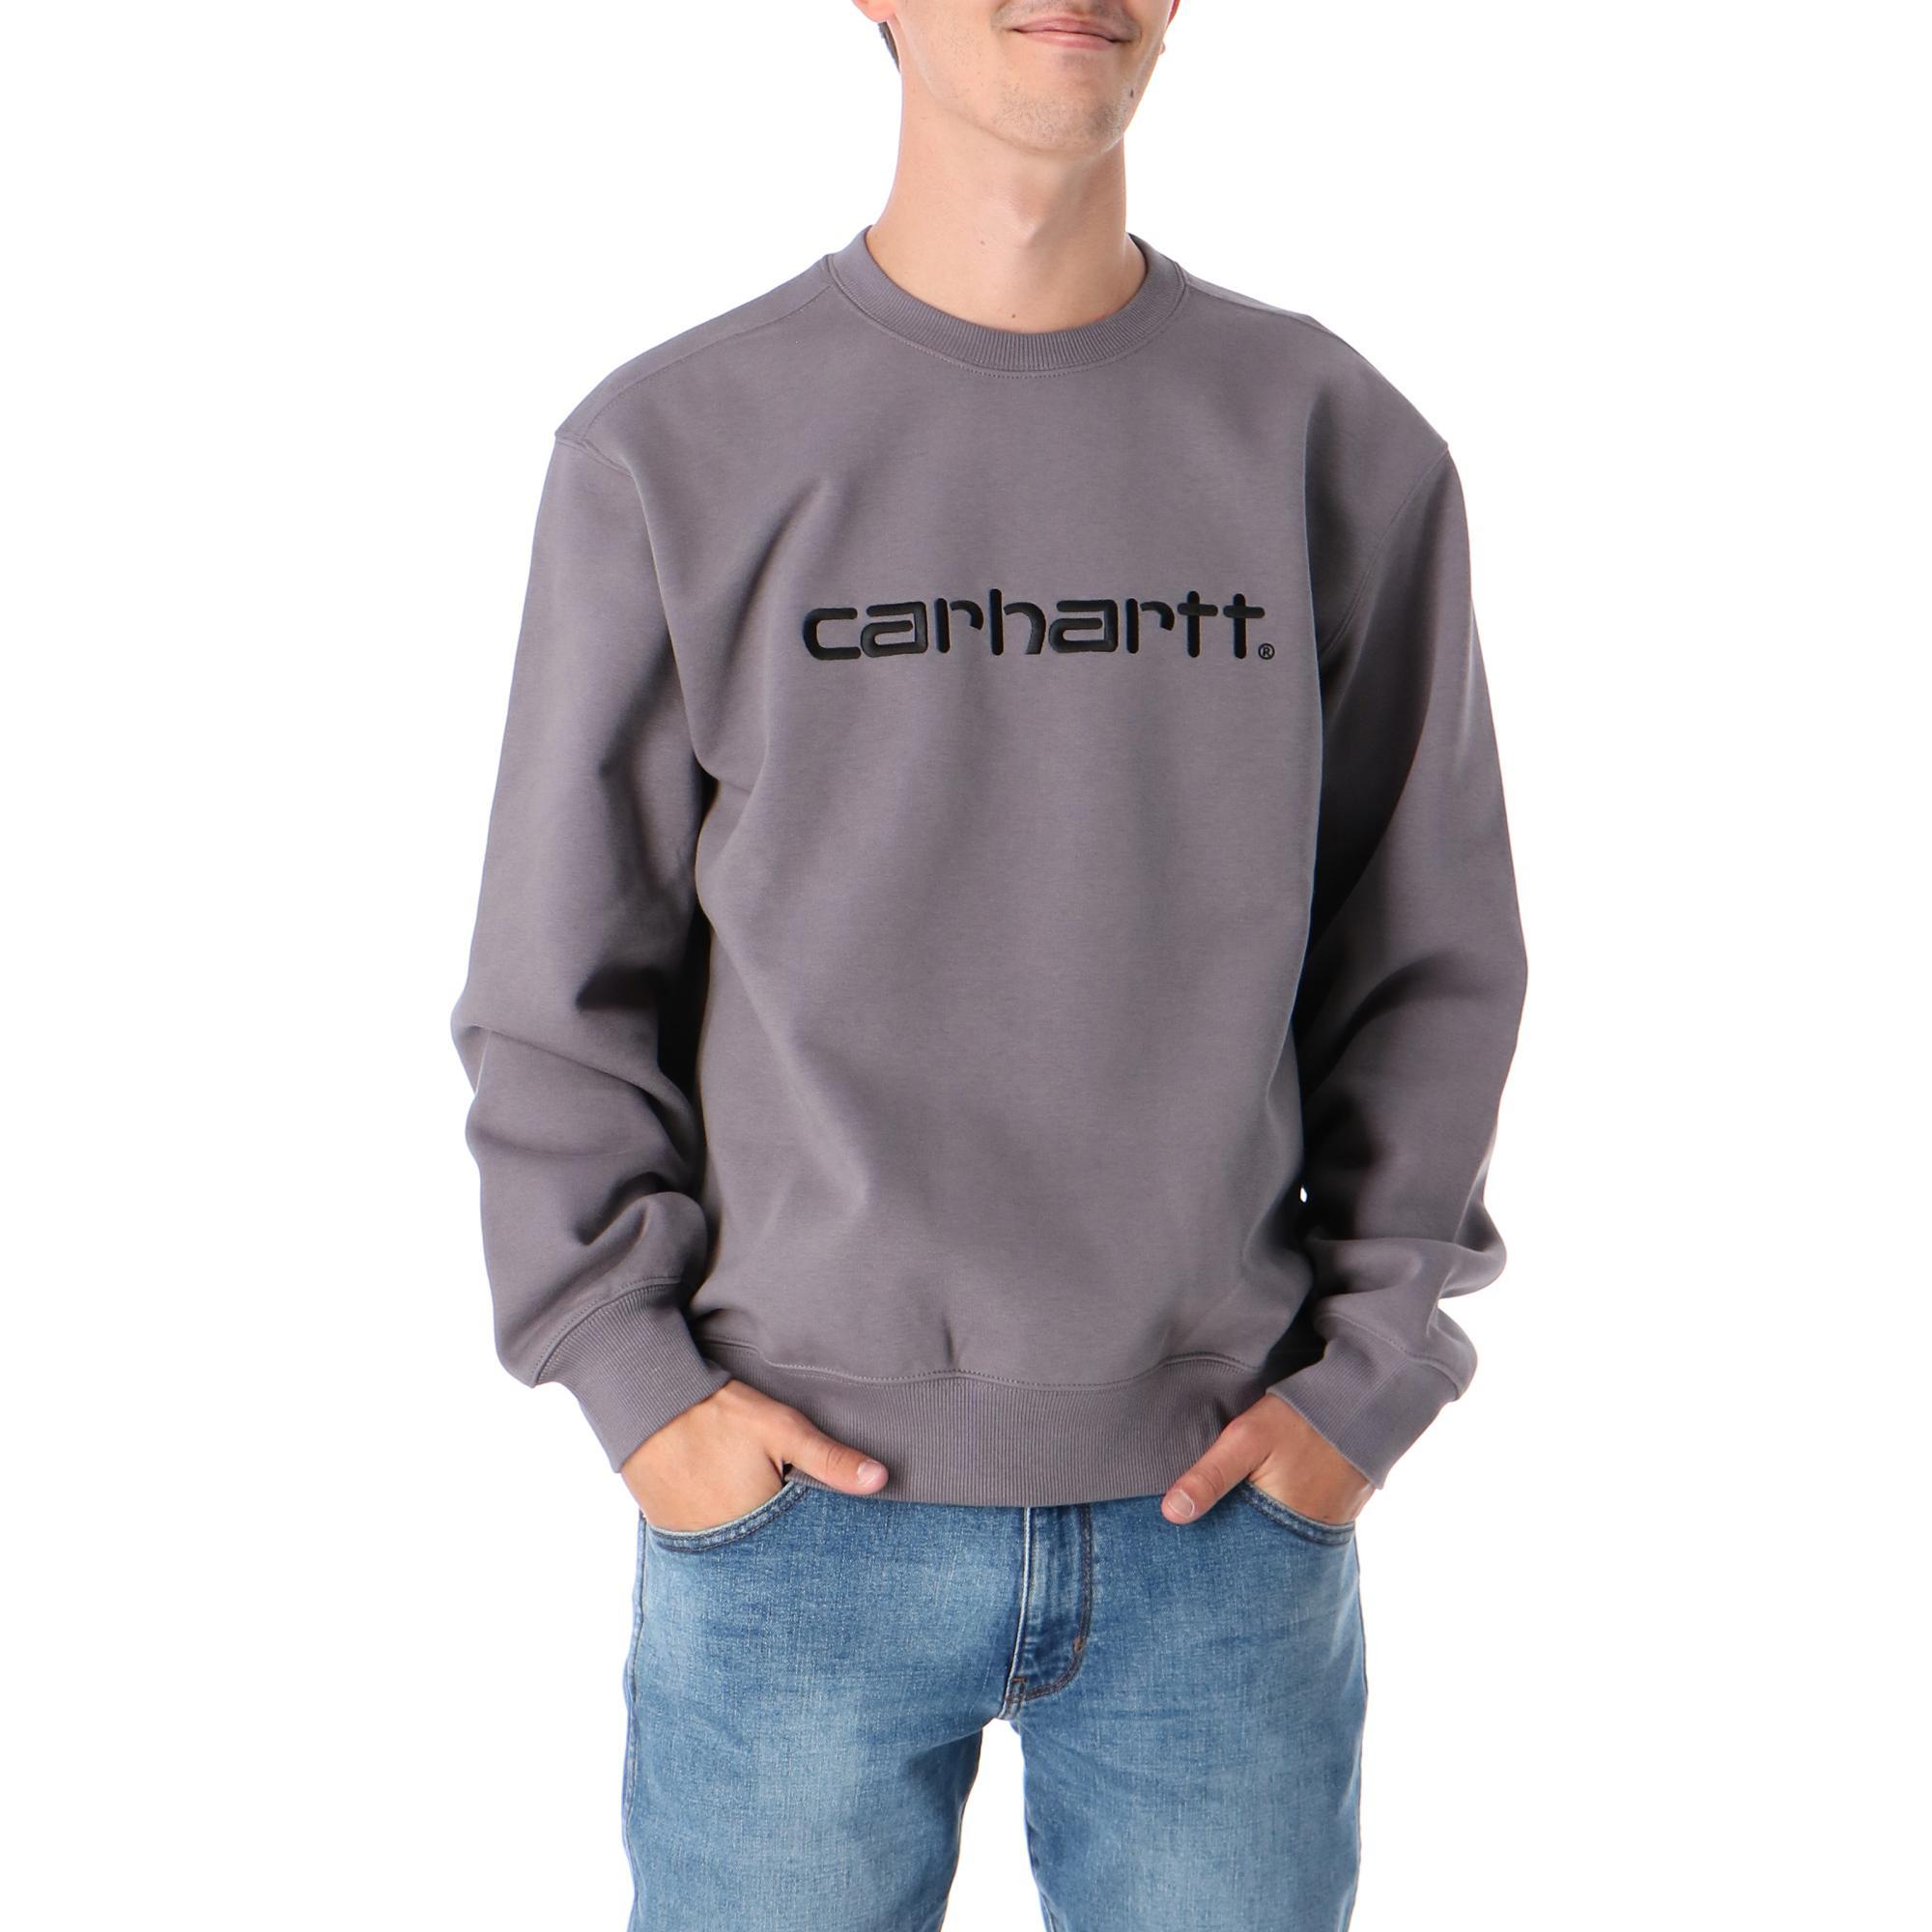 Carhartt Sweatshirt Husky black